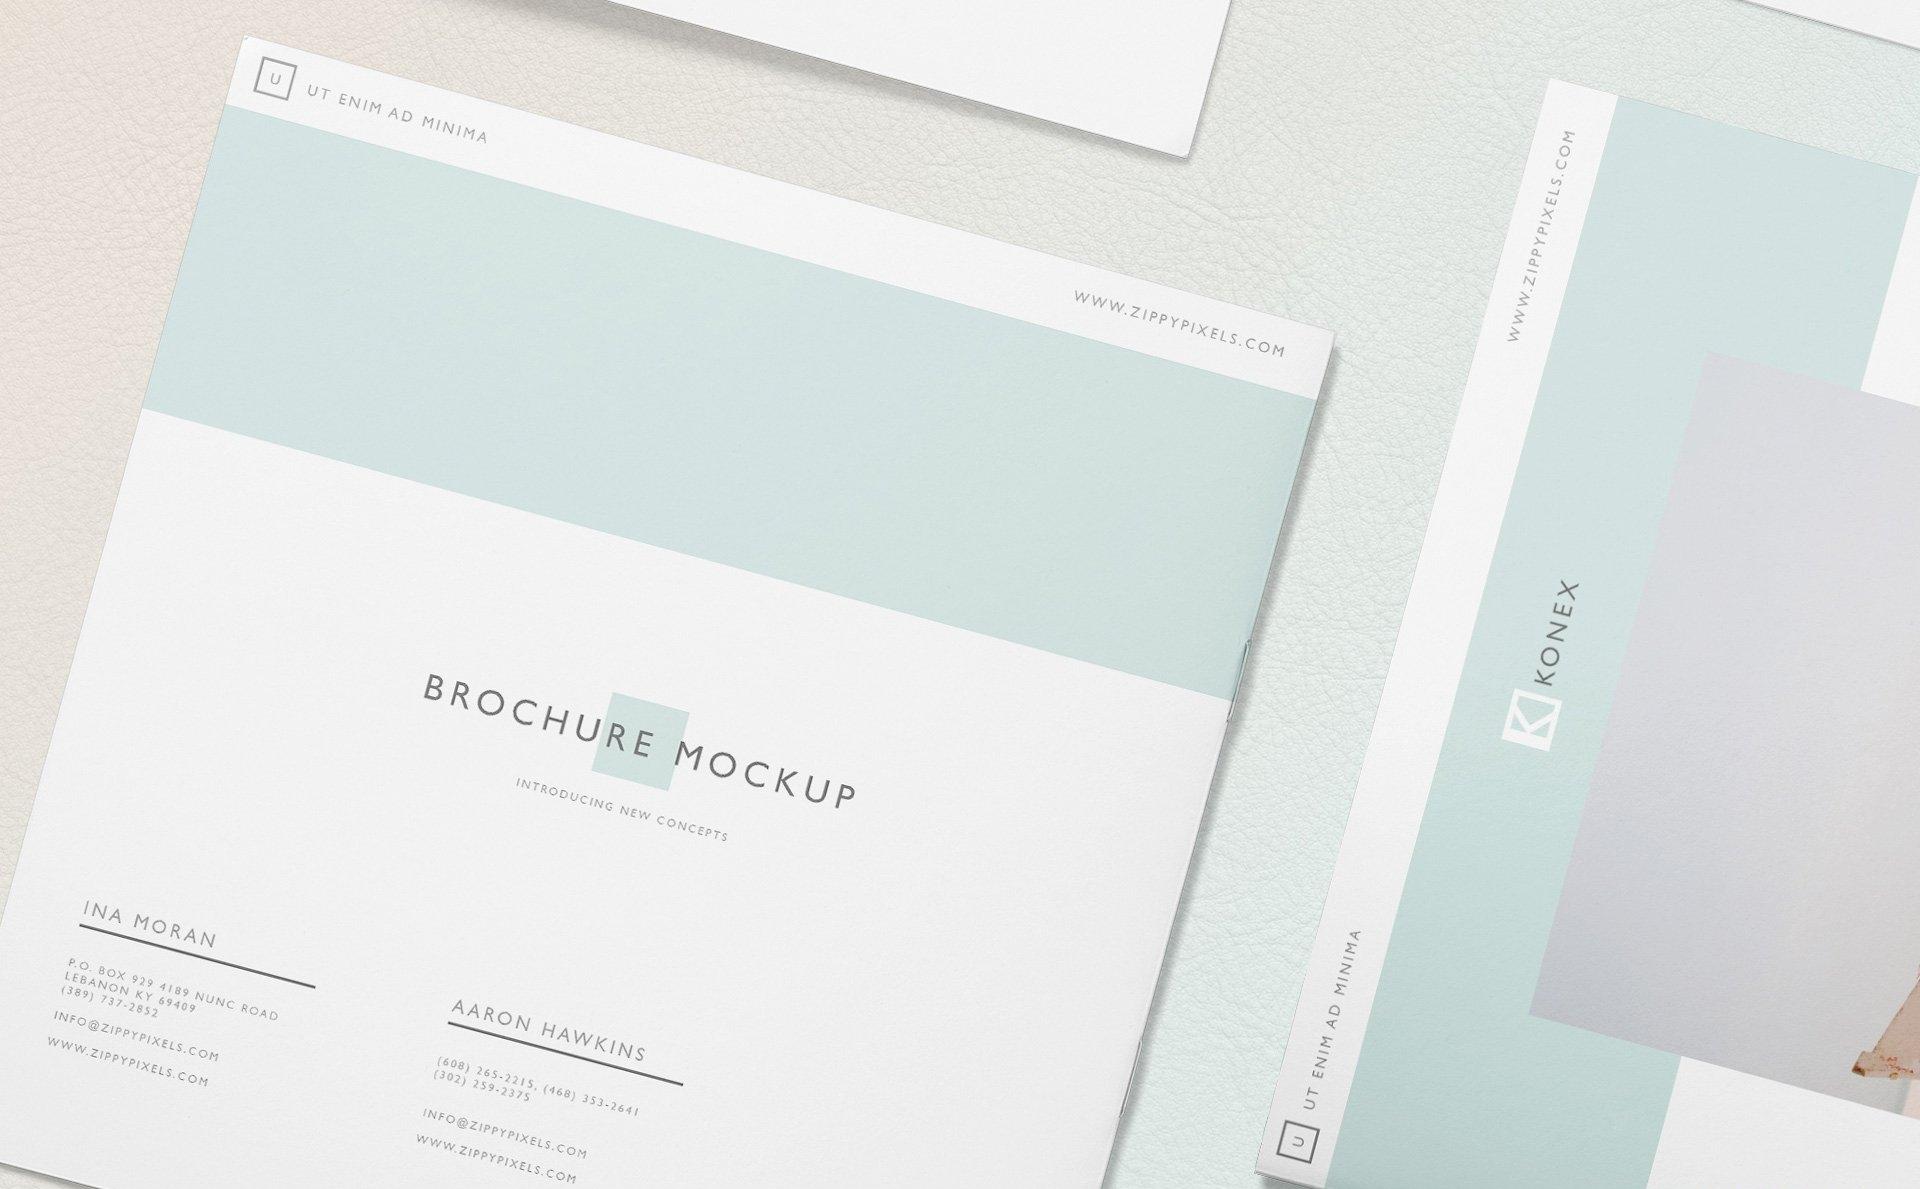 企业品牌办公样机展示  智能贴图296-square-brochure-mockup-free